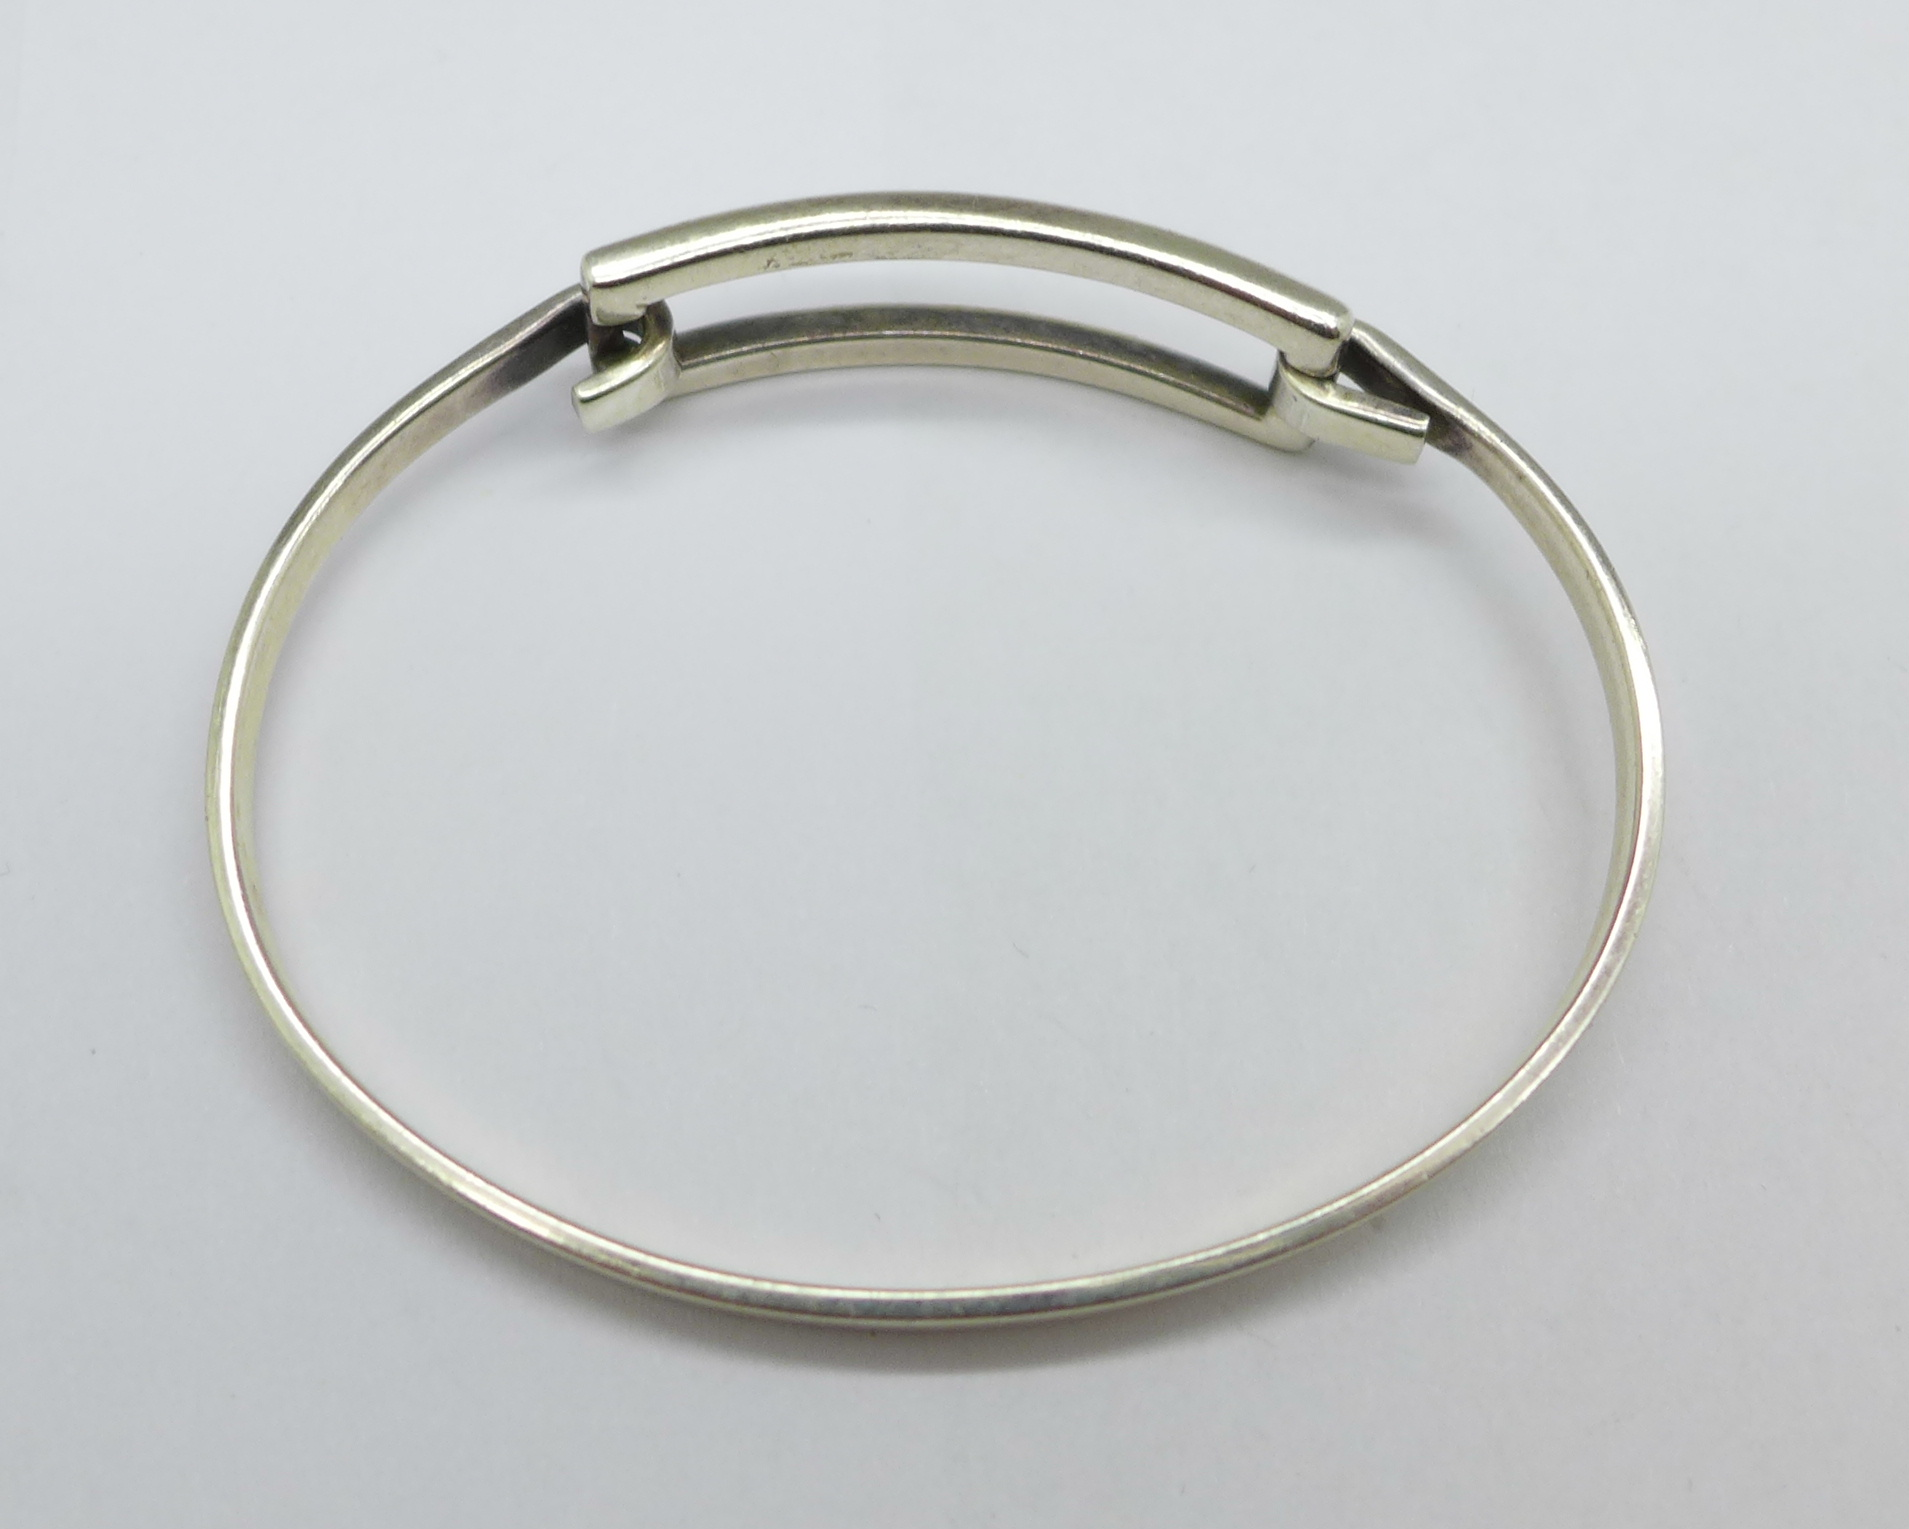 A silver Tiffany bangle, 15g - Image 2 of 3